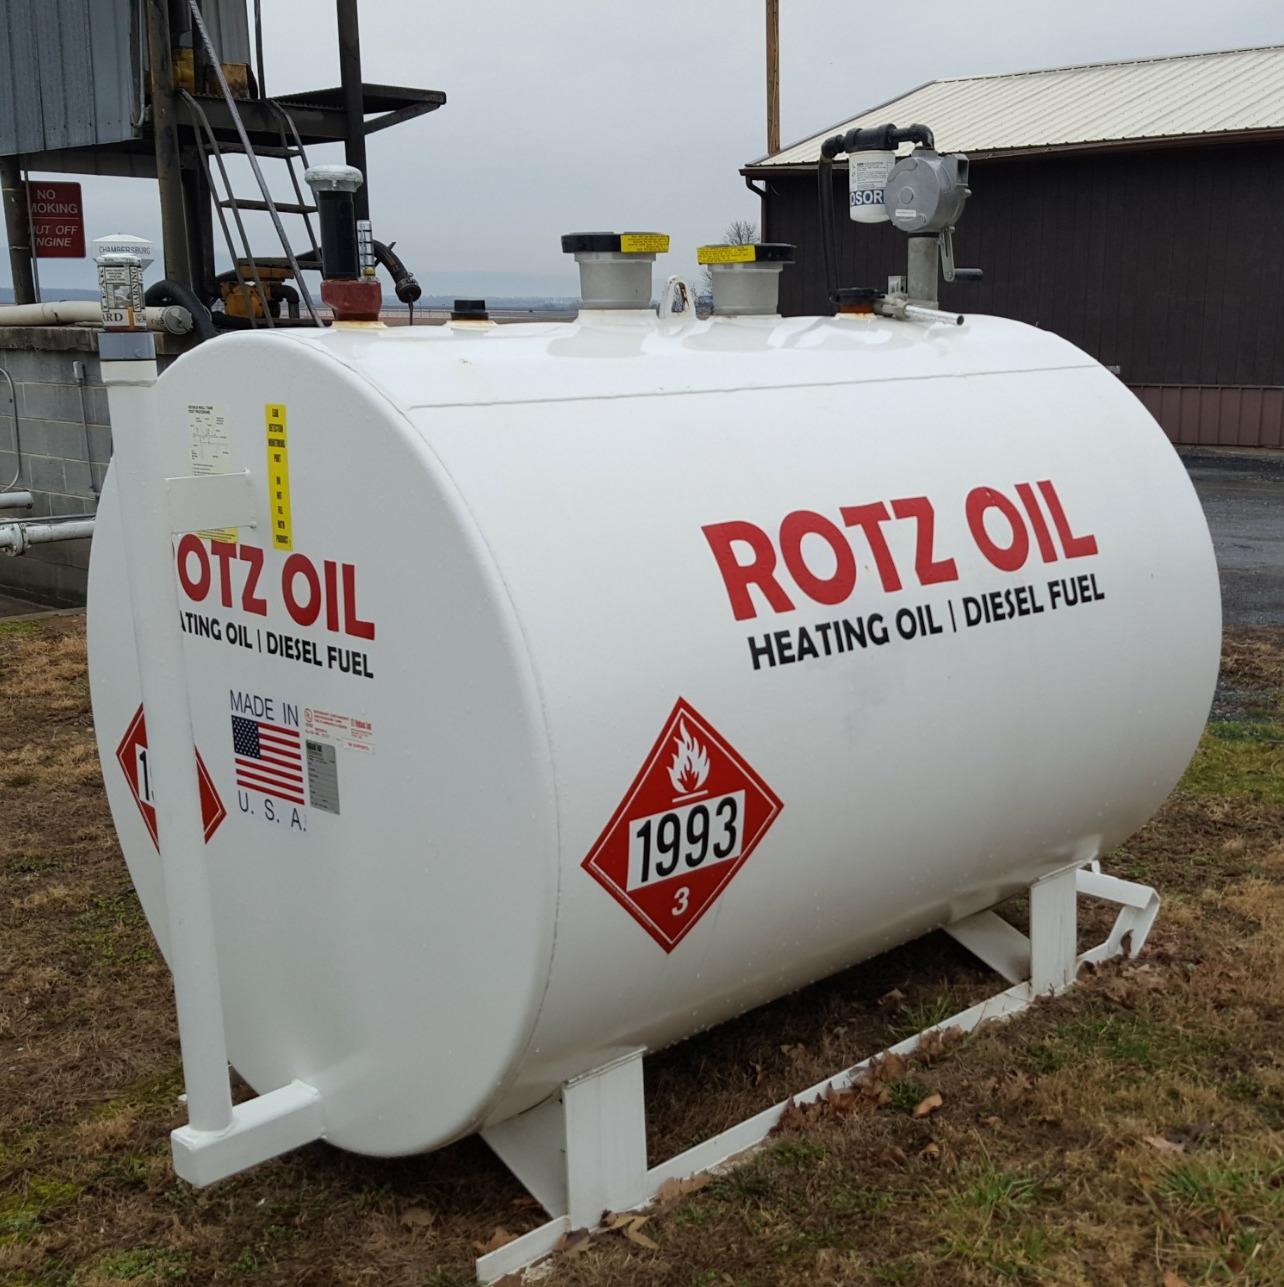 Rotz Oil image 1